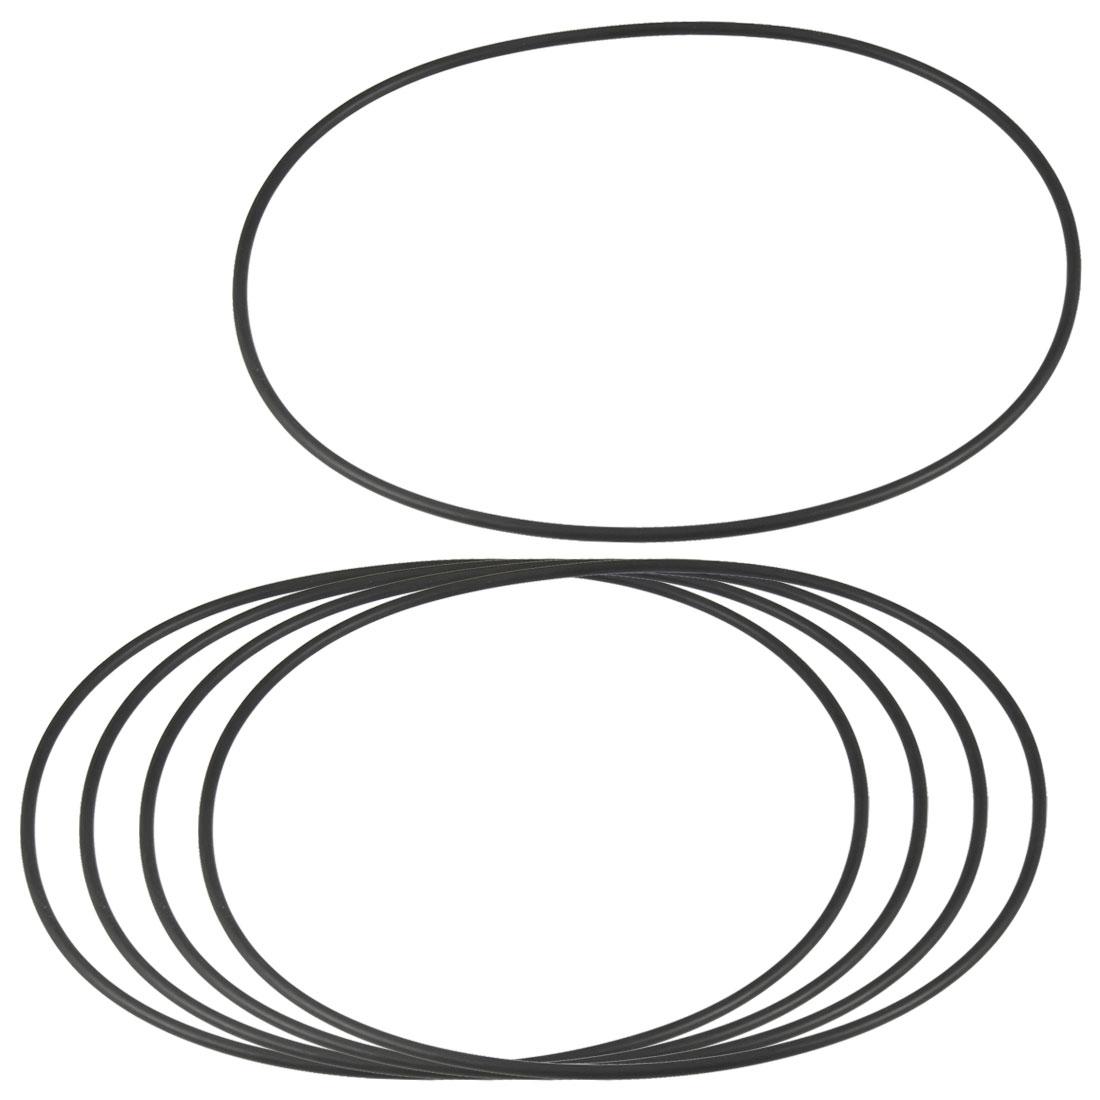 5 Pcs 160mm x 3.1mm Flexible Rubber O Rings Sealing Washer Black